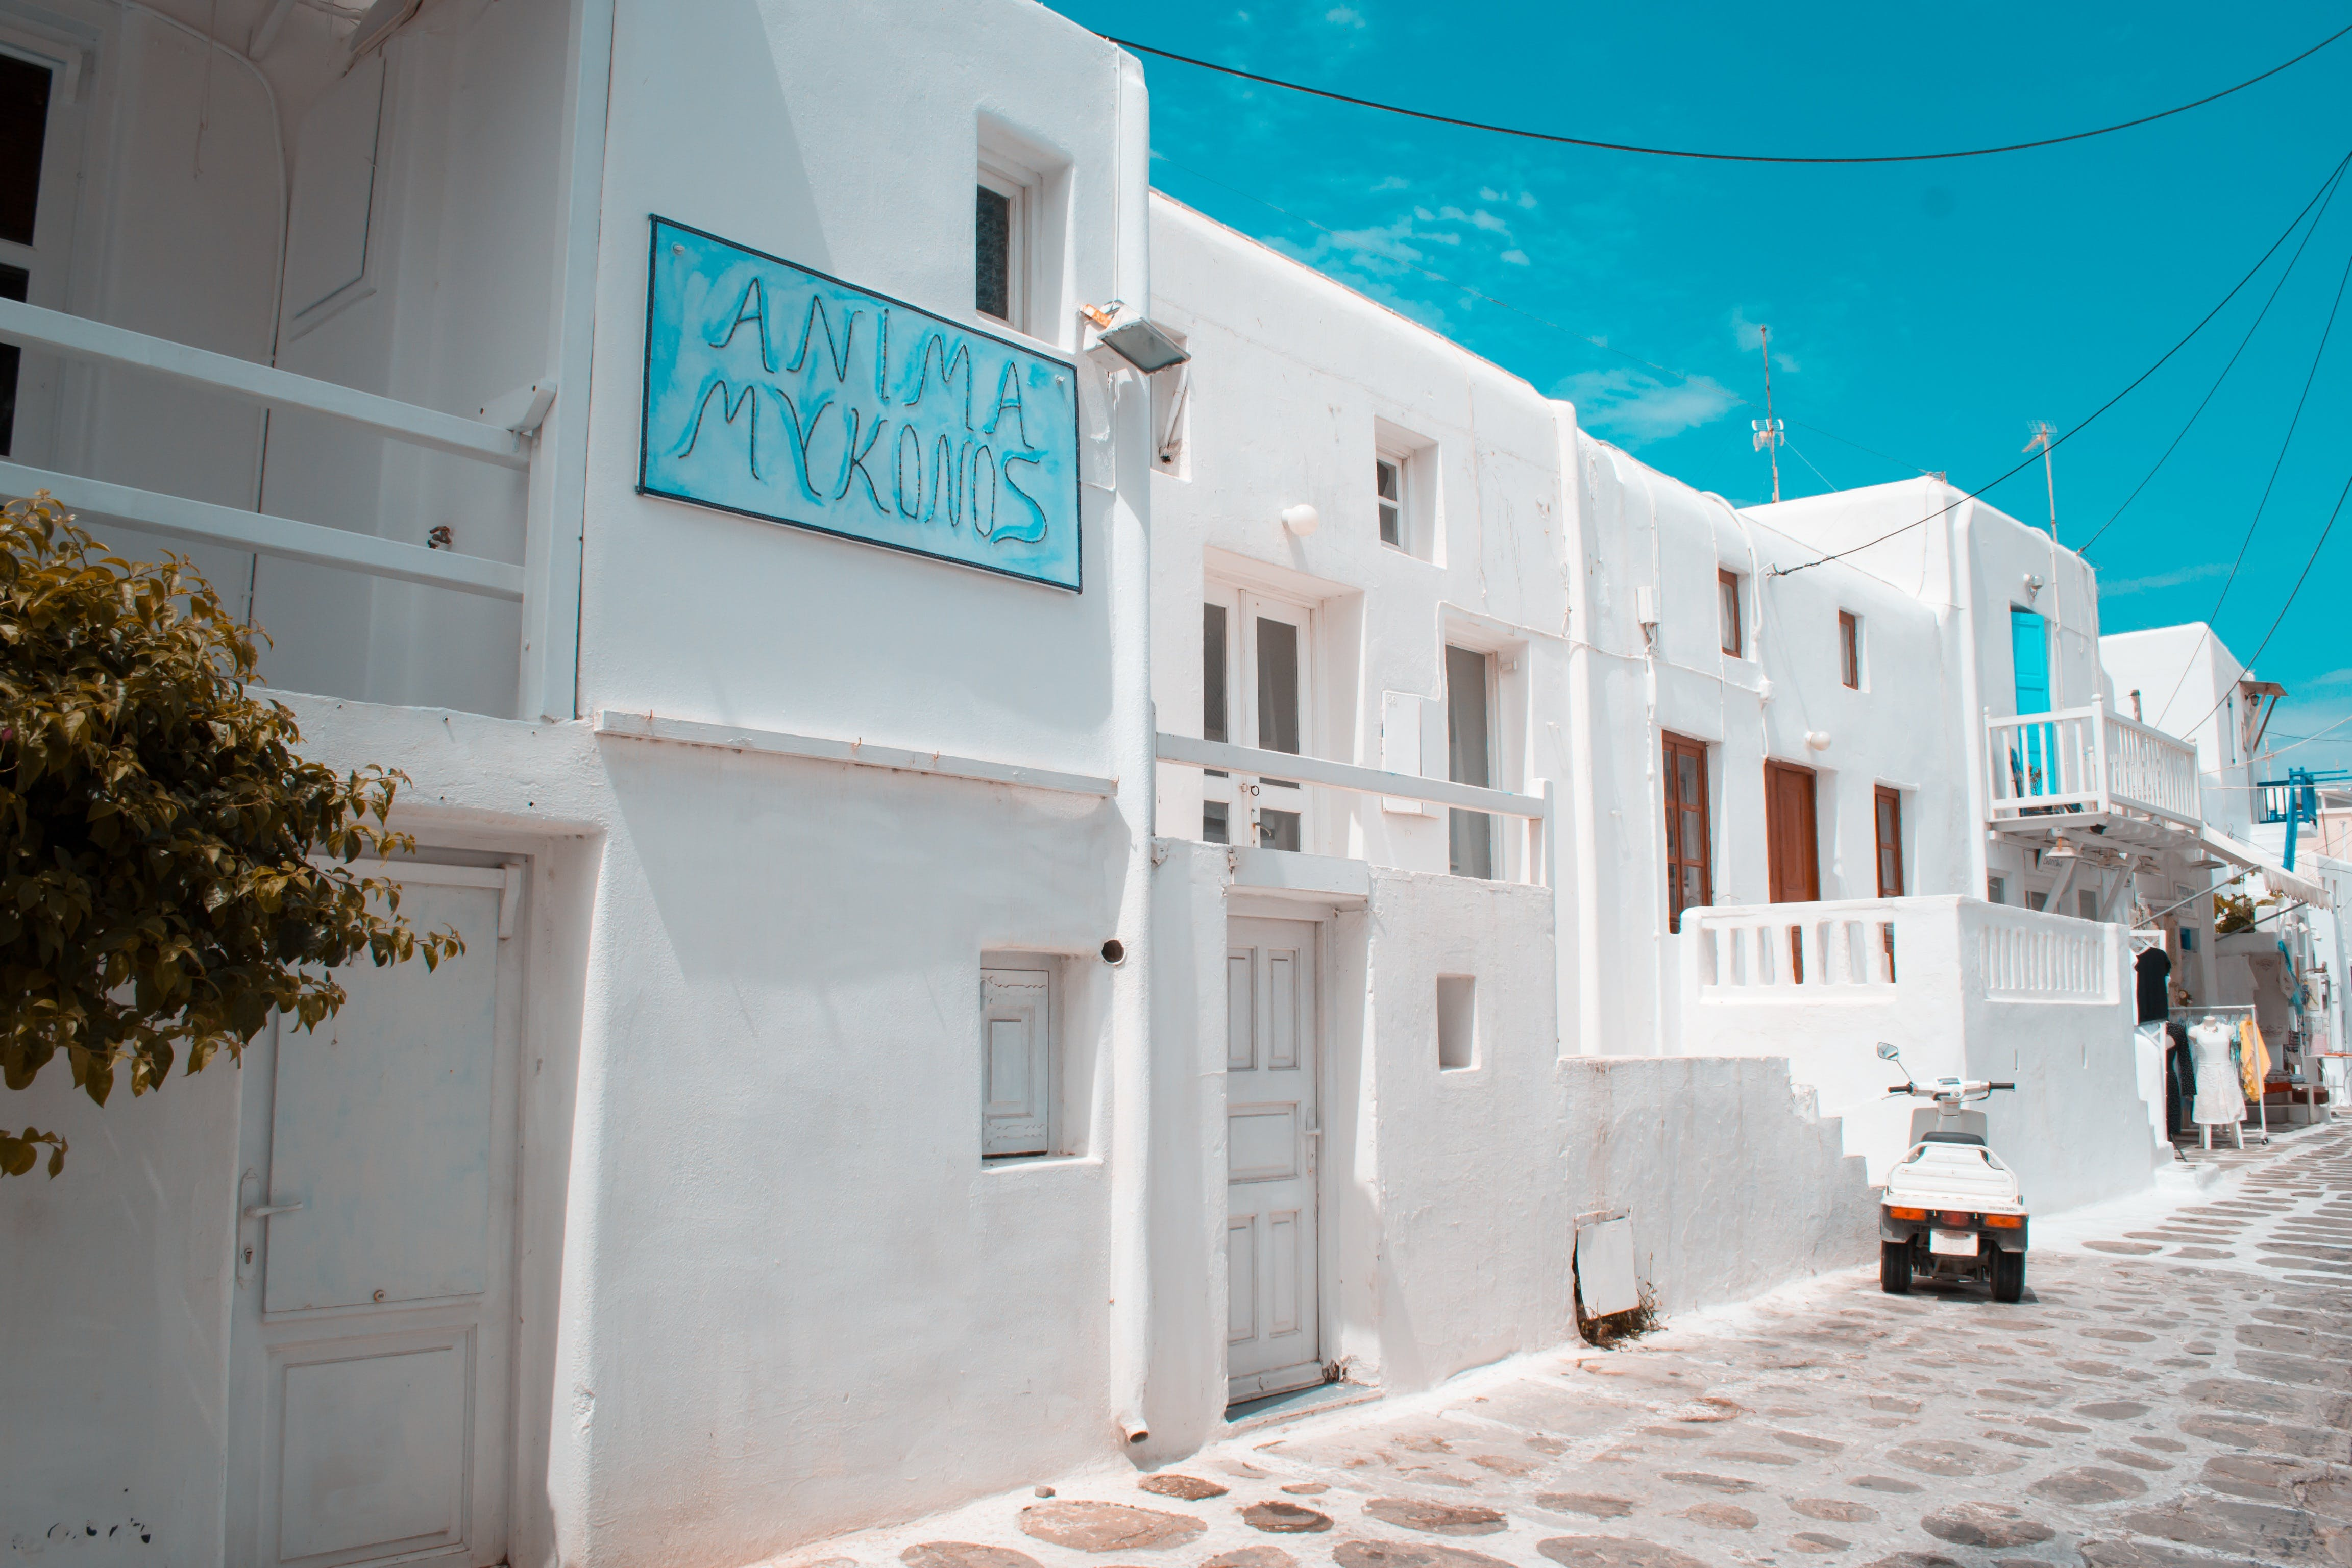 Free stock photo of destination, free images, free photos, greece